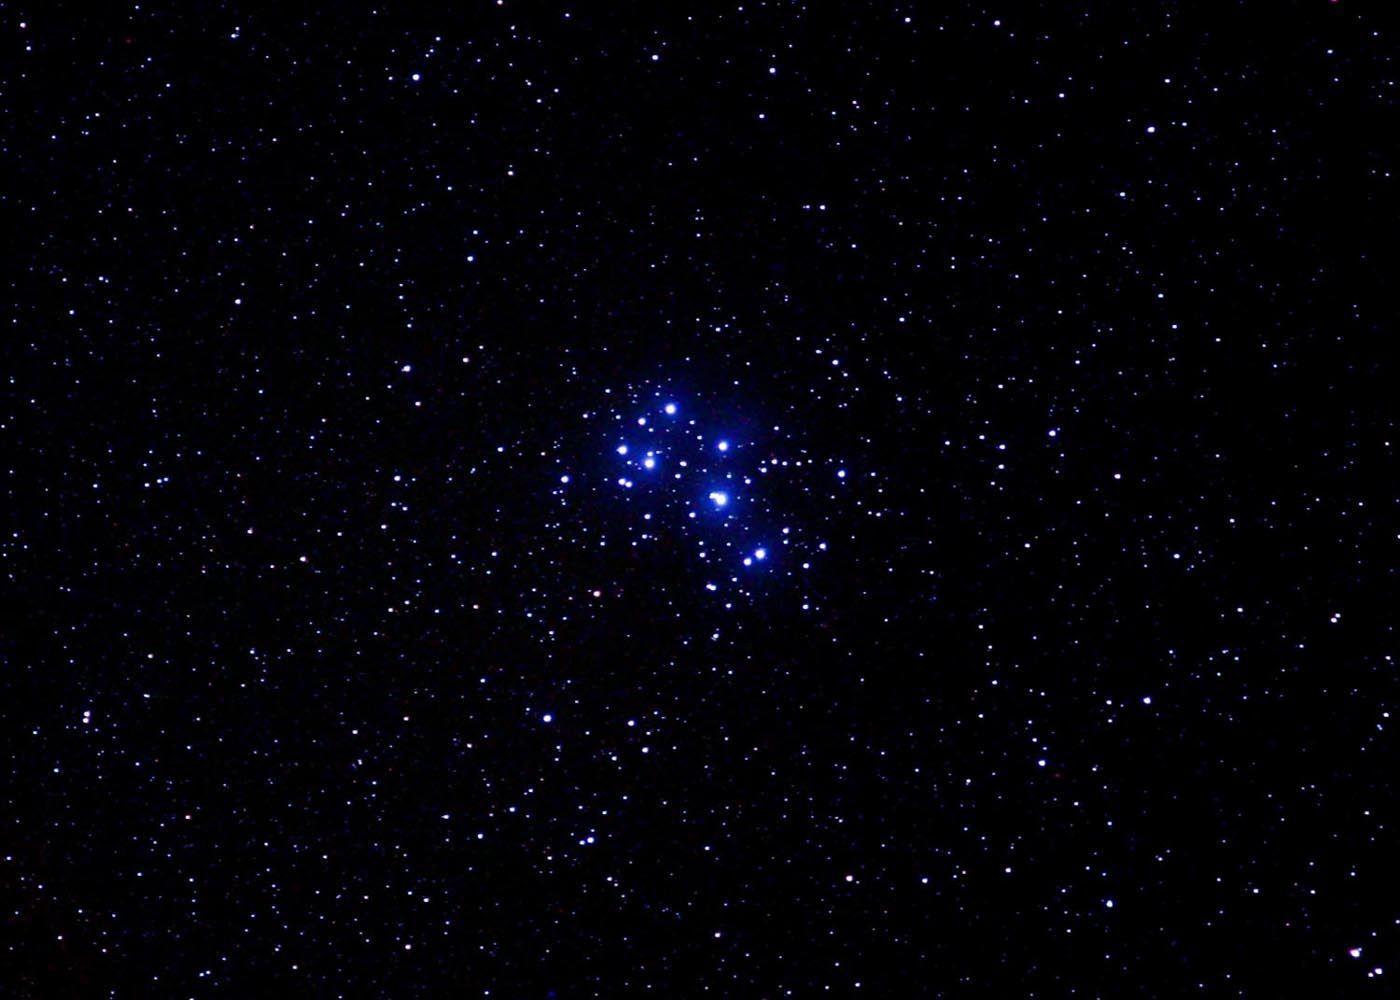 pleiades star cluster subaru - photo #6